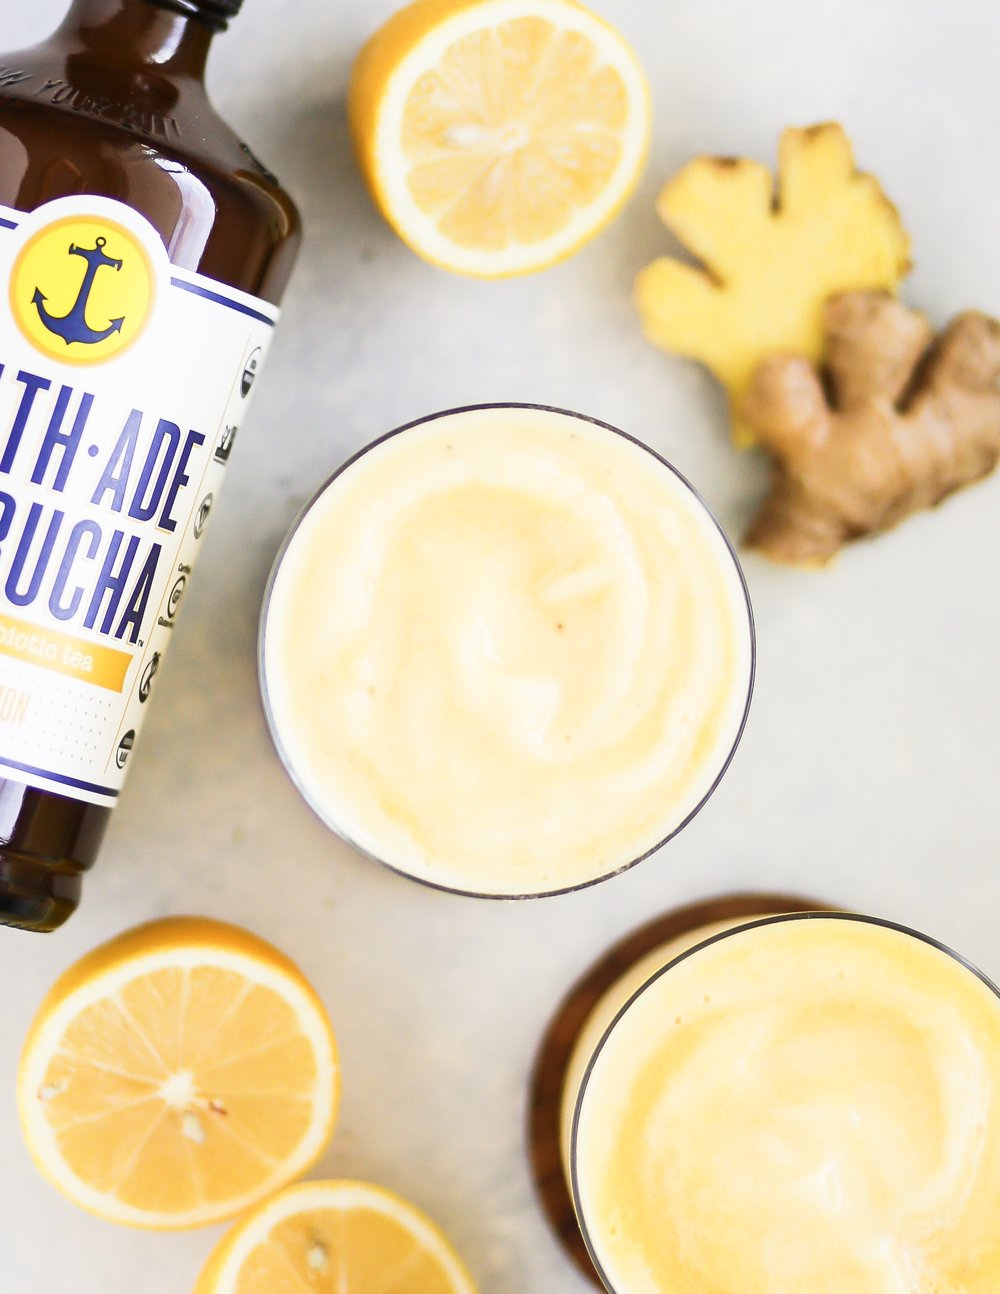 Ginger Lemon Kombucha Smoothie | Set the Table #guthealth #followyourgut #healthadepartner #smoothie #recipe #probioticsmoothie